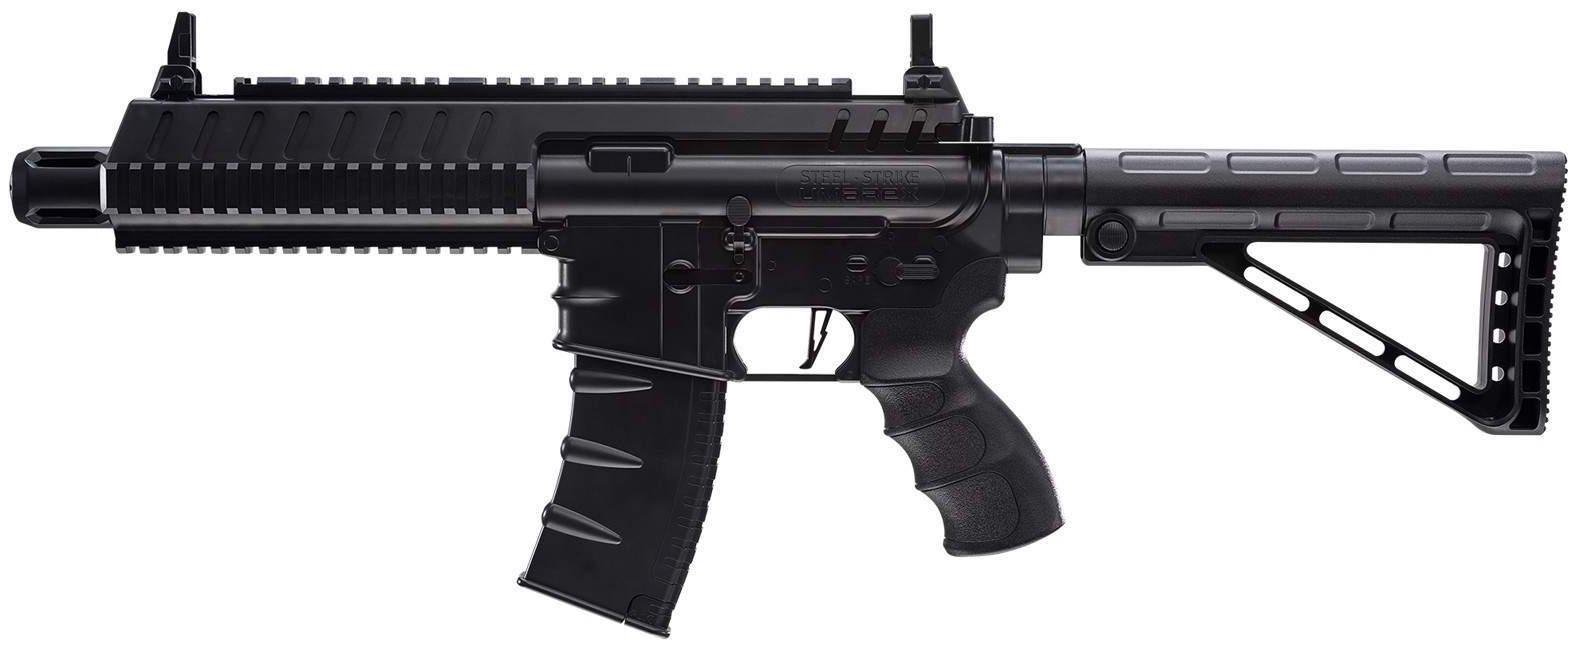 Umarex Steel Strike CO2 Blowback BB Rifle Left Side.jpg